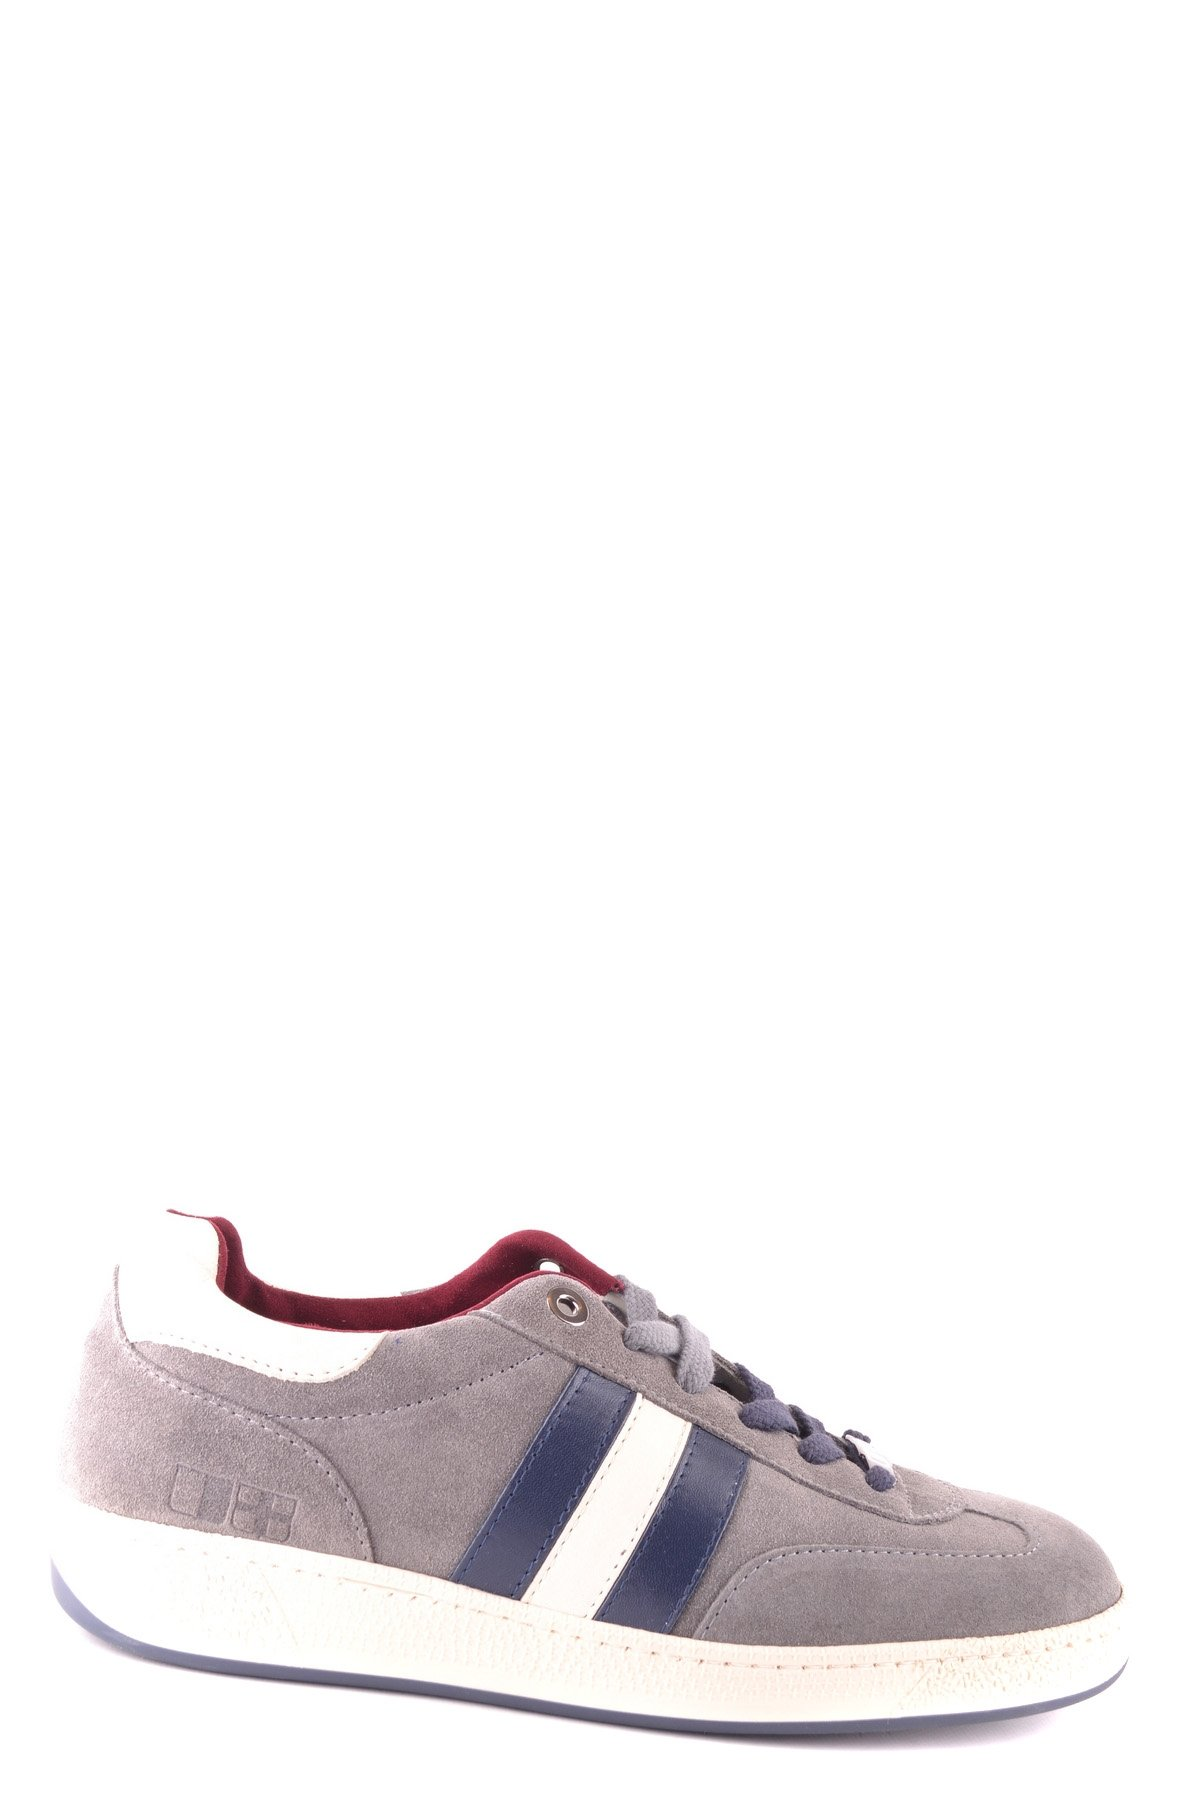 Deals For Dacquasparta Mens MCBI361002O Grey Suede Sneakers